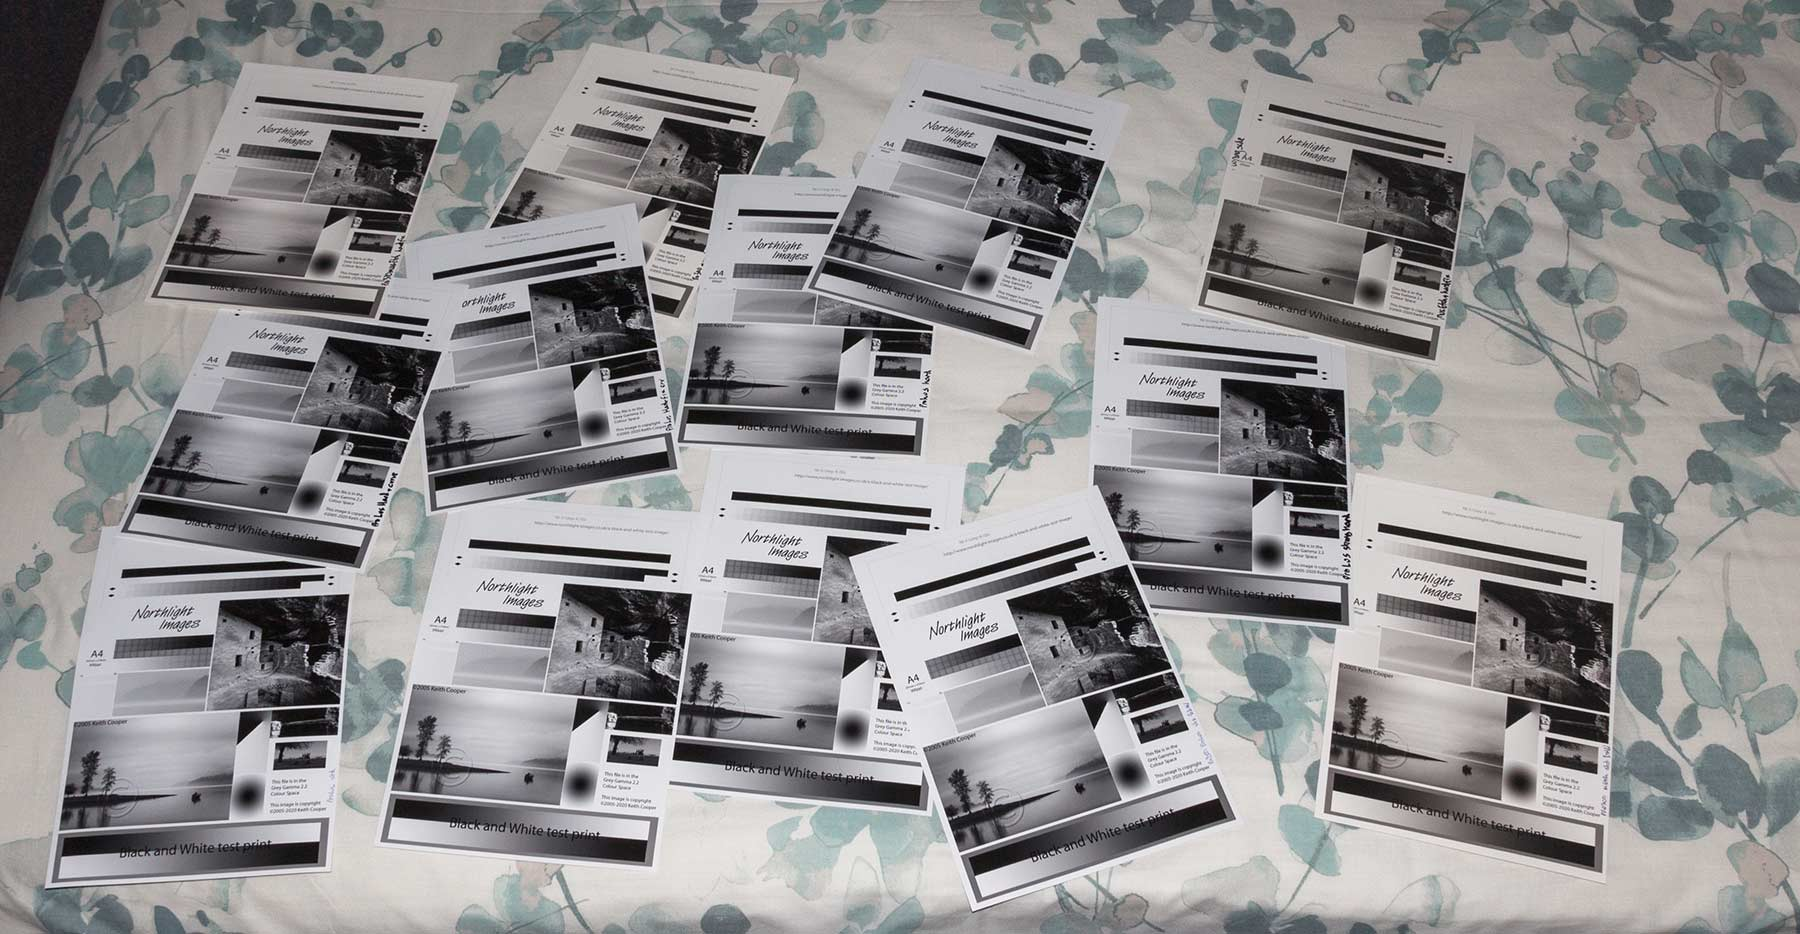 bw-test-prints